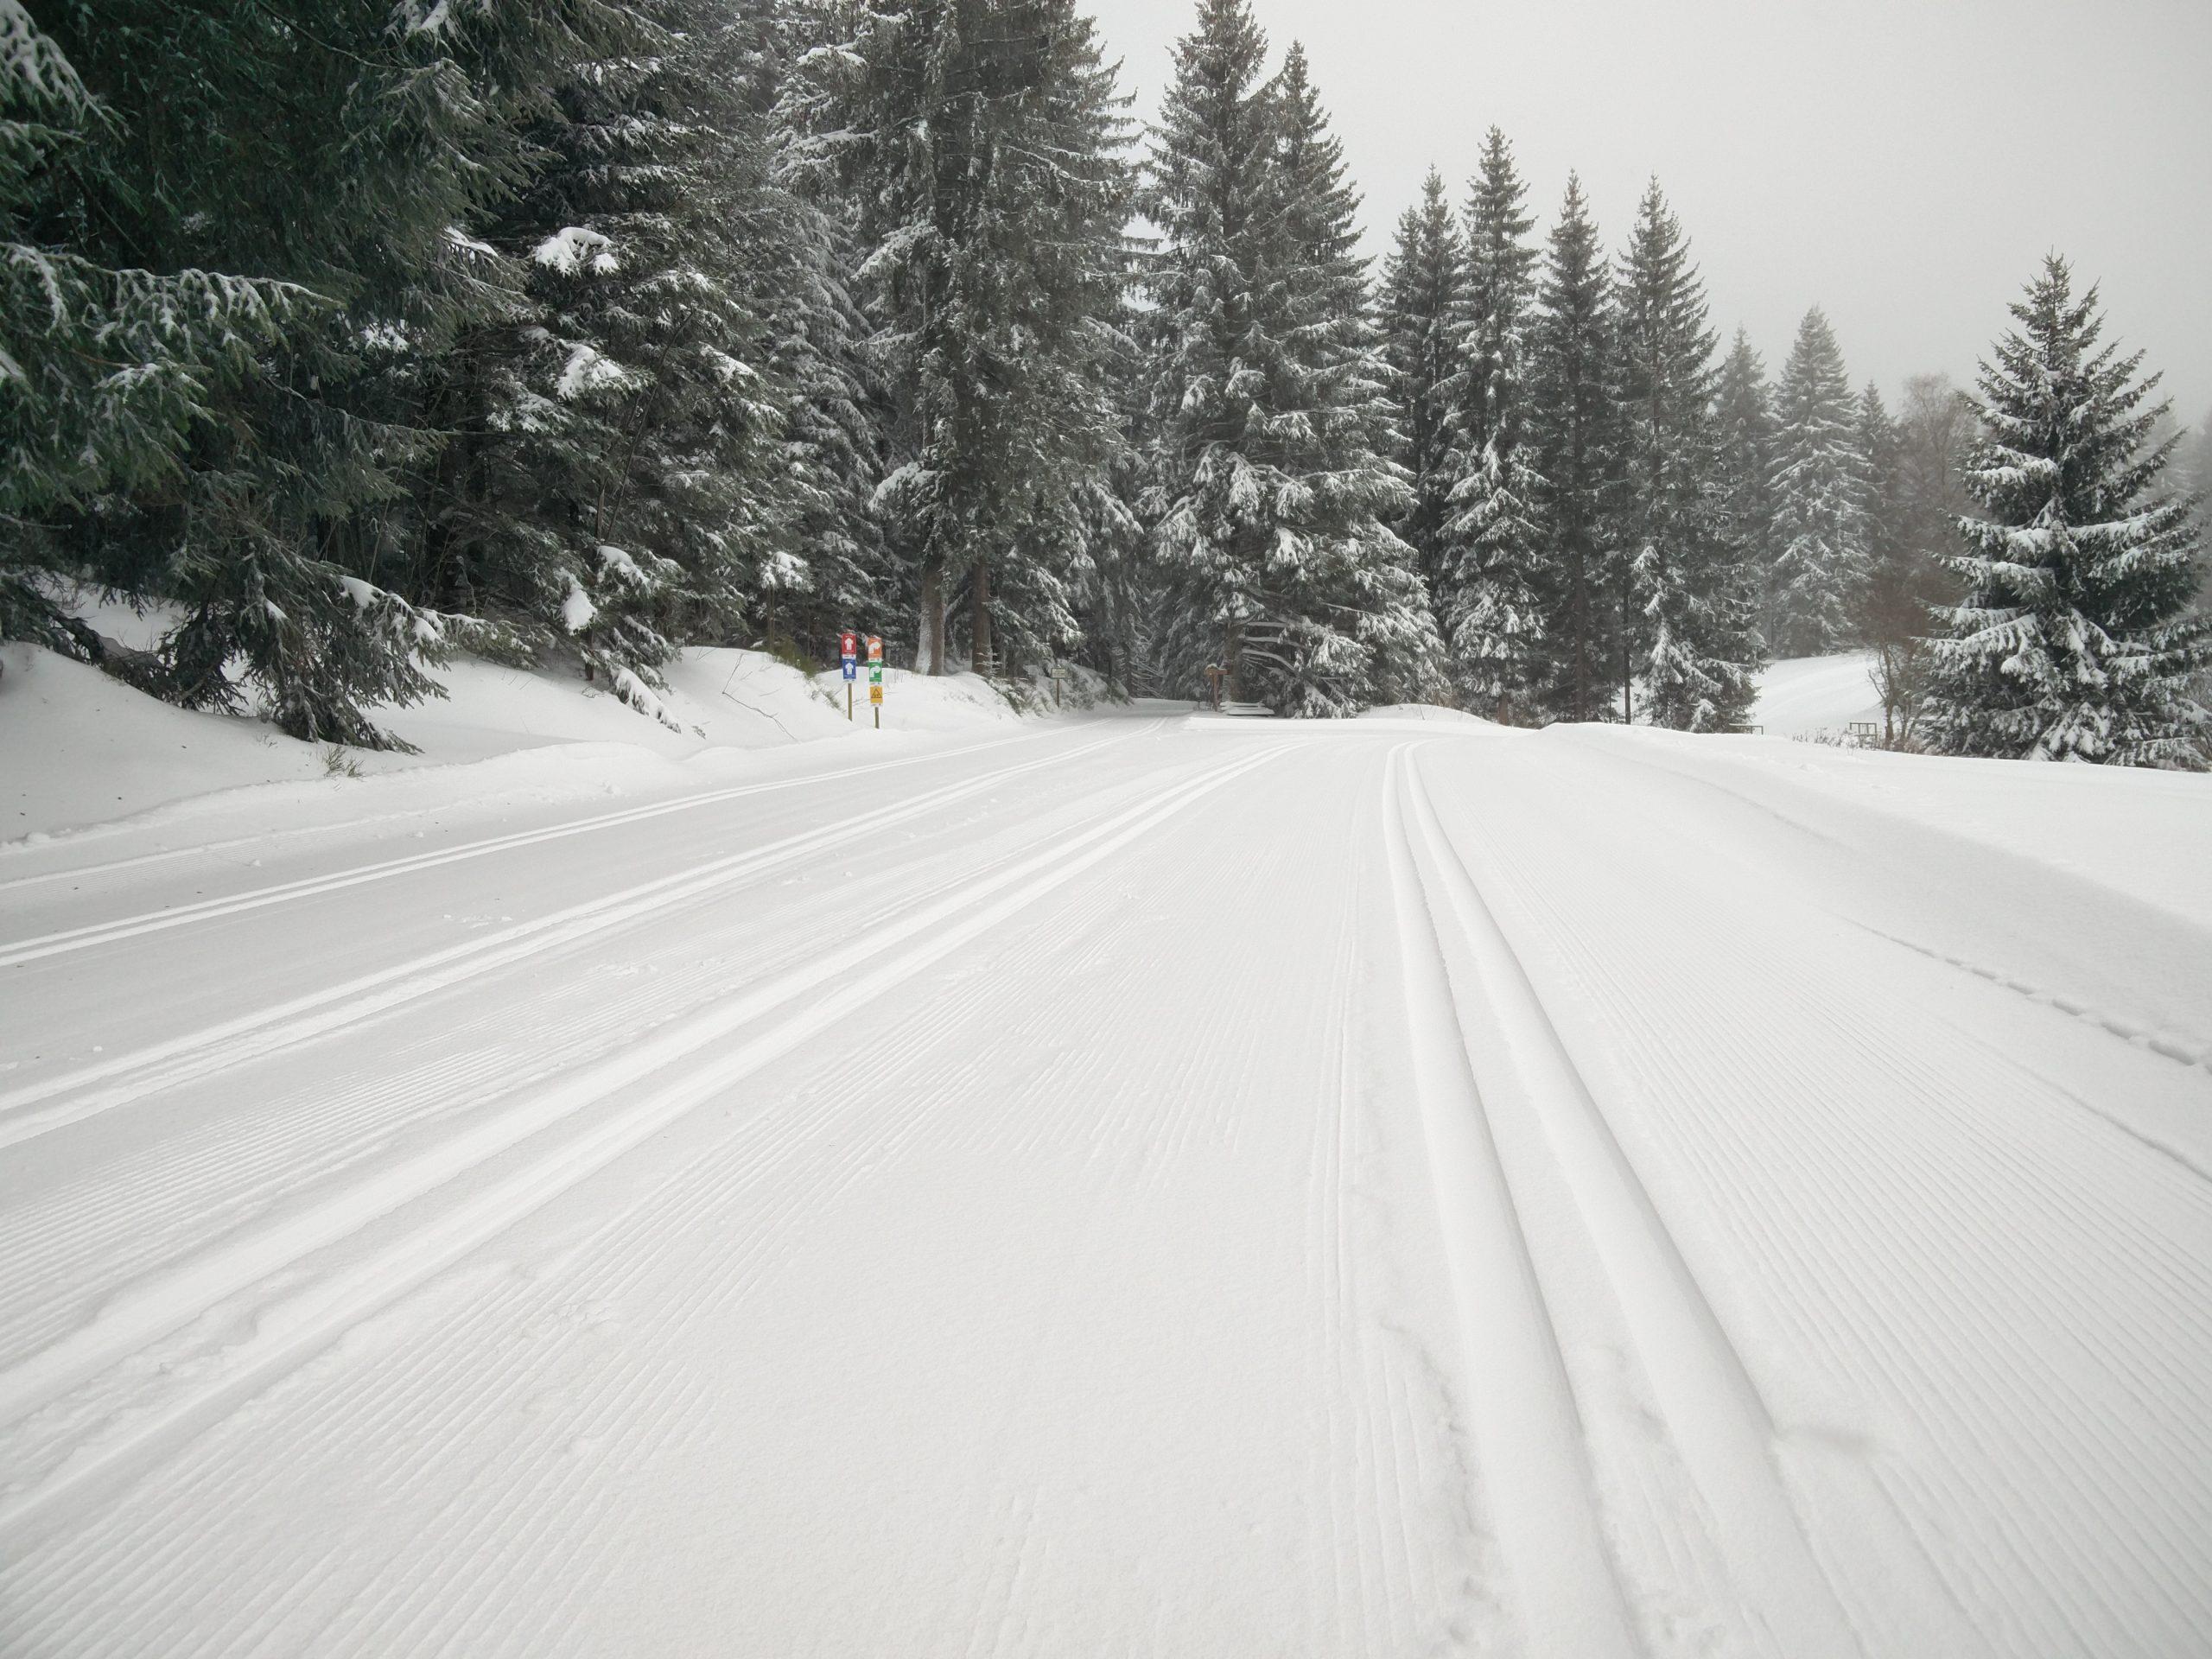 Langlauf-Center Herrenwies